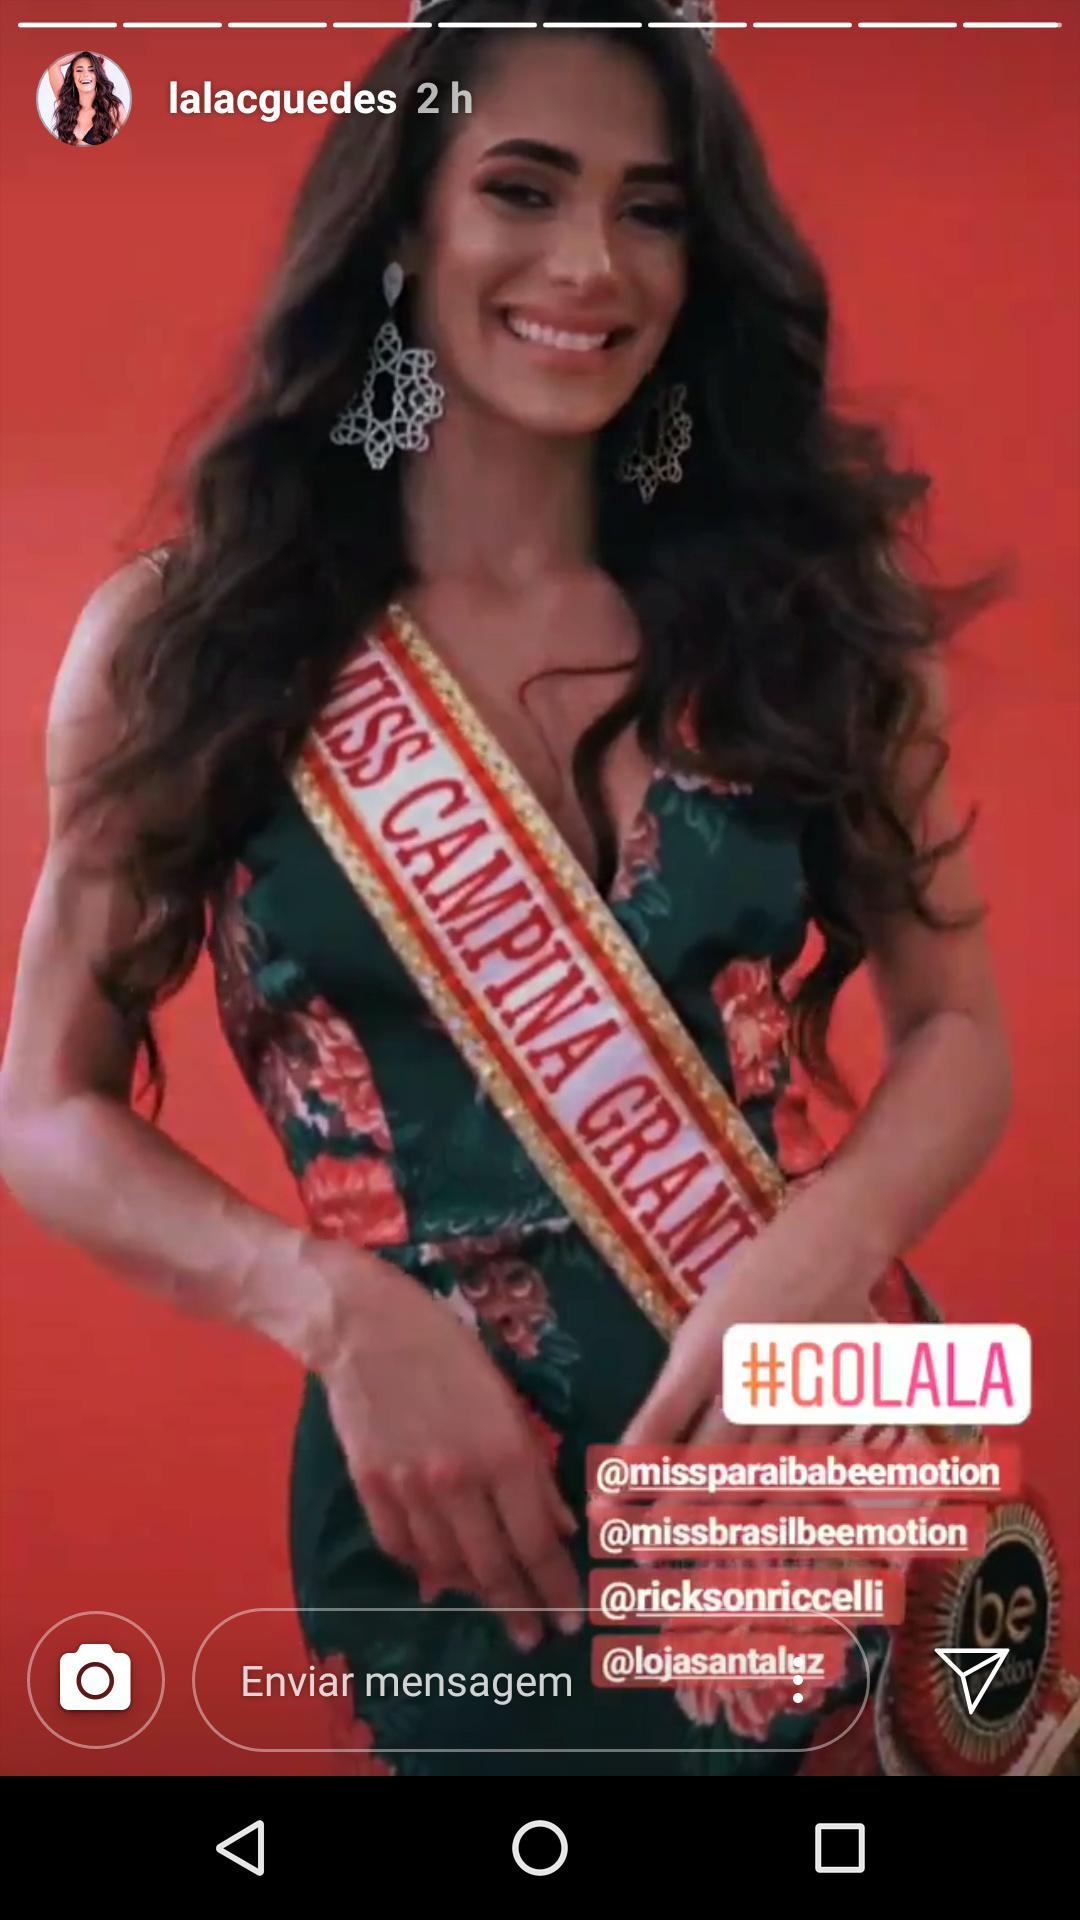 lala guedes, miss grand brasil 2020. - Página 3 74999410